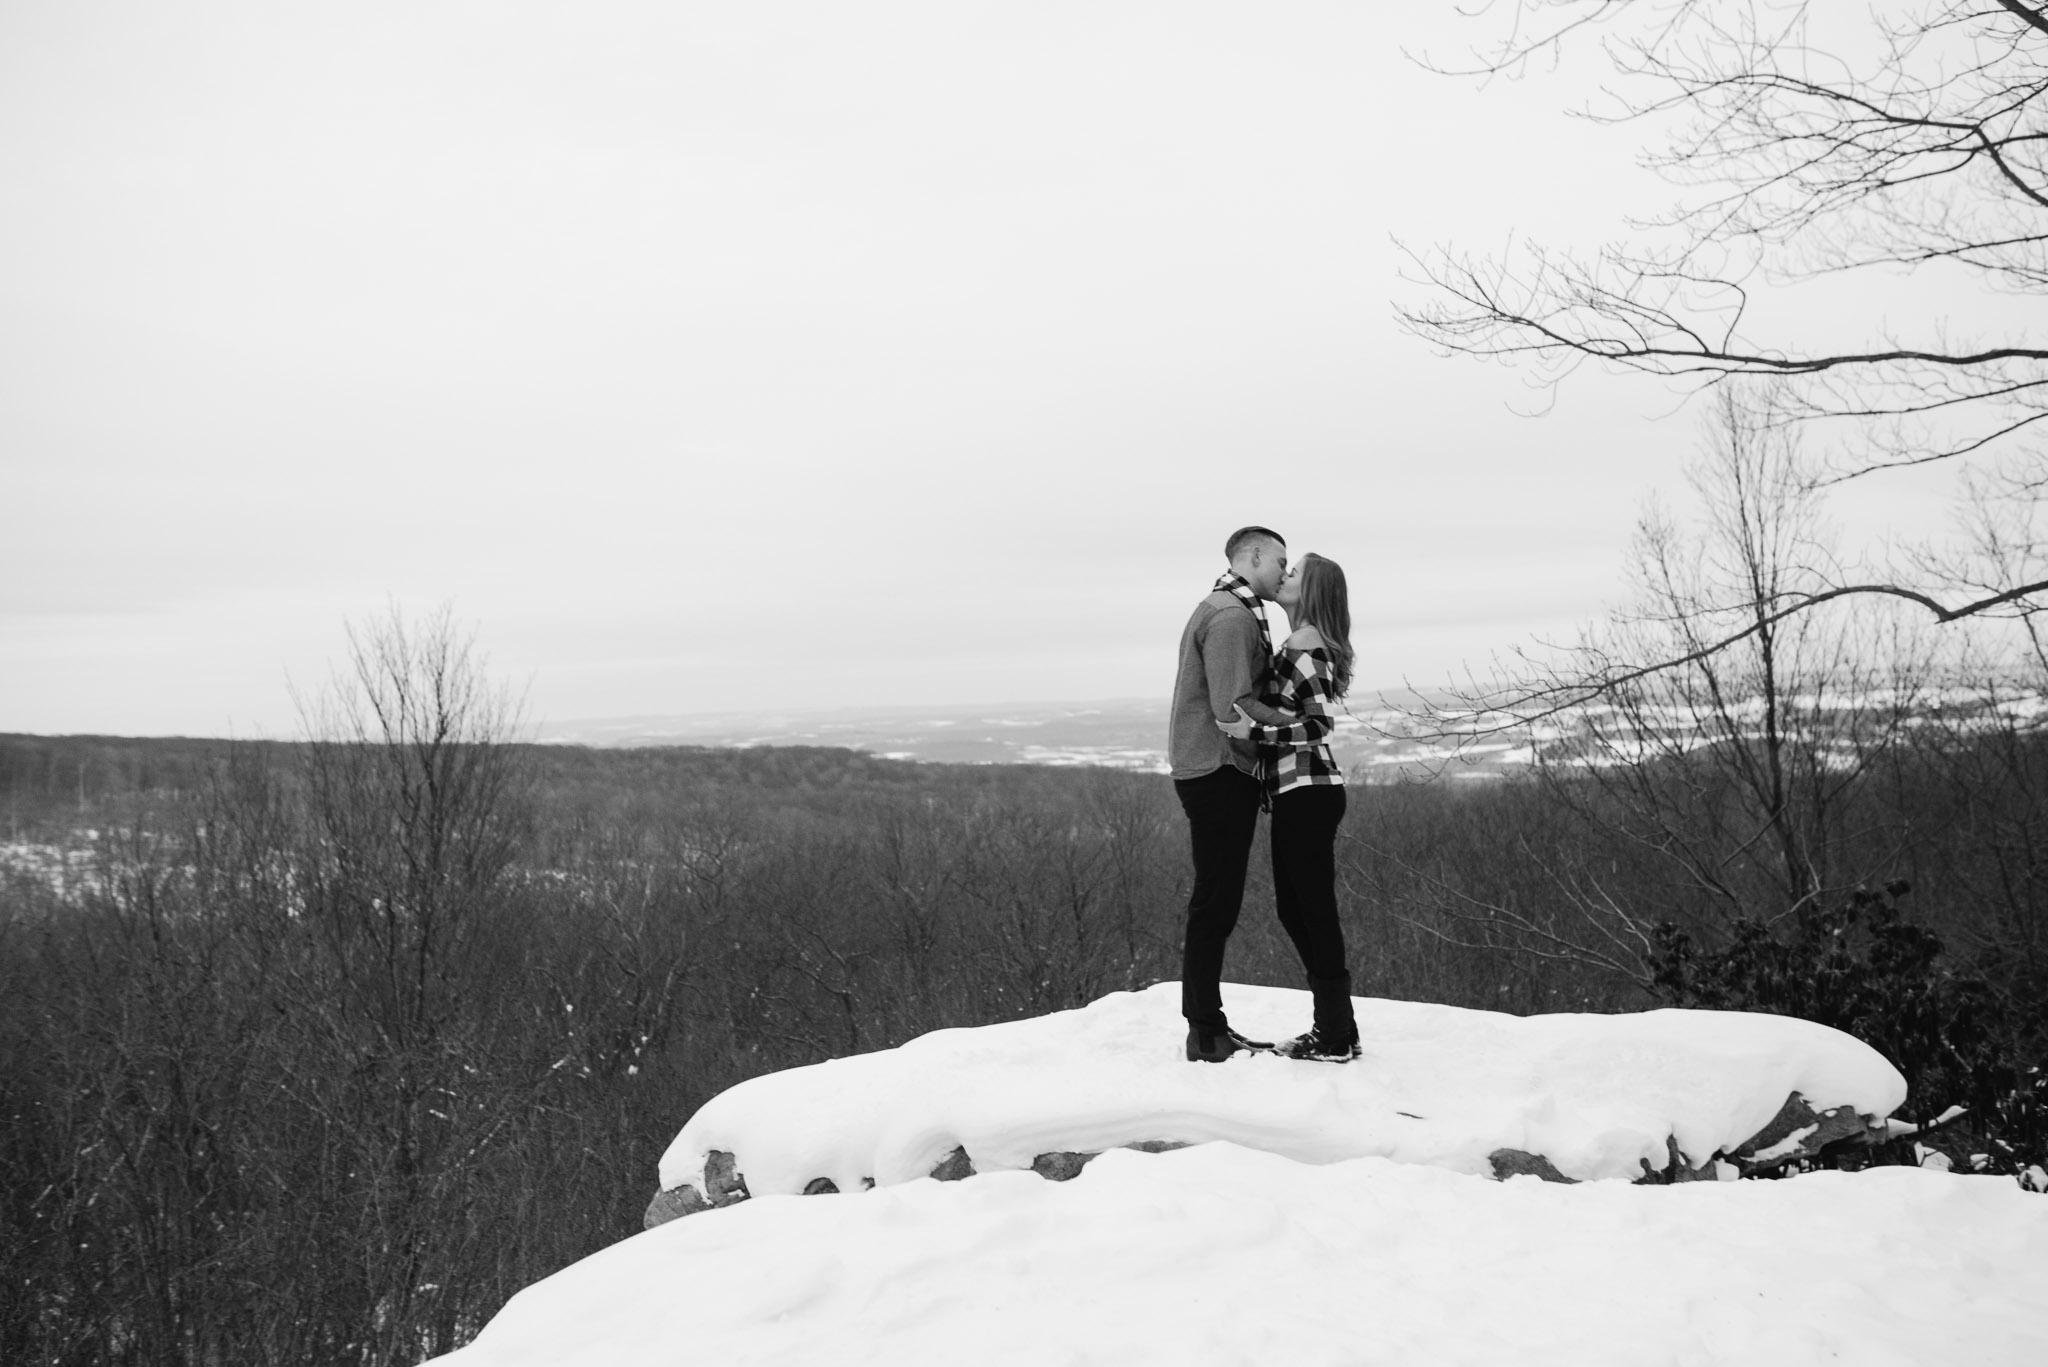 Ligonier-Linn-Run-Engagement-Session-Pittsburgh-Photographer-Mariah-Fisher-6.jpg